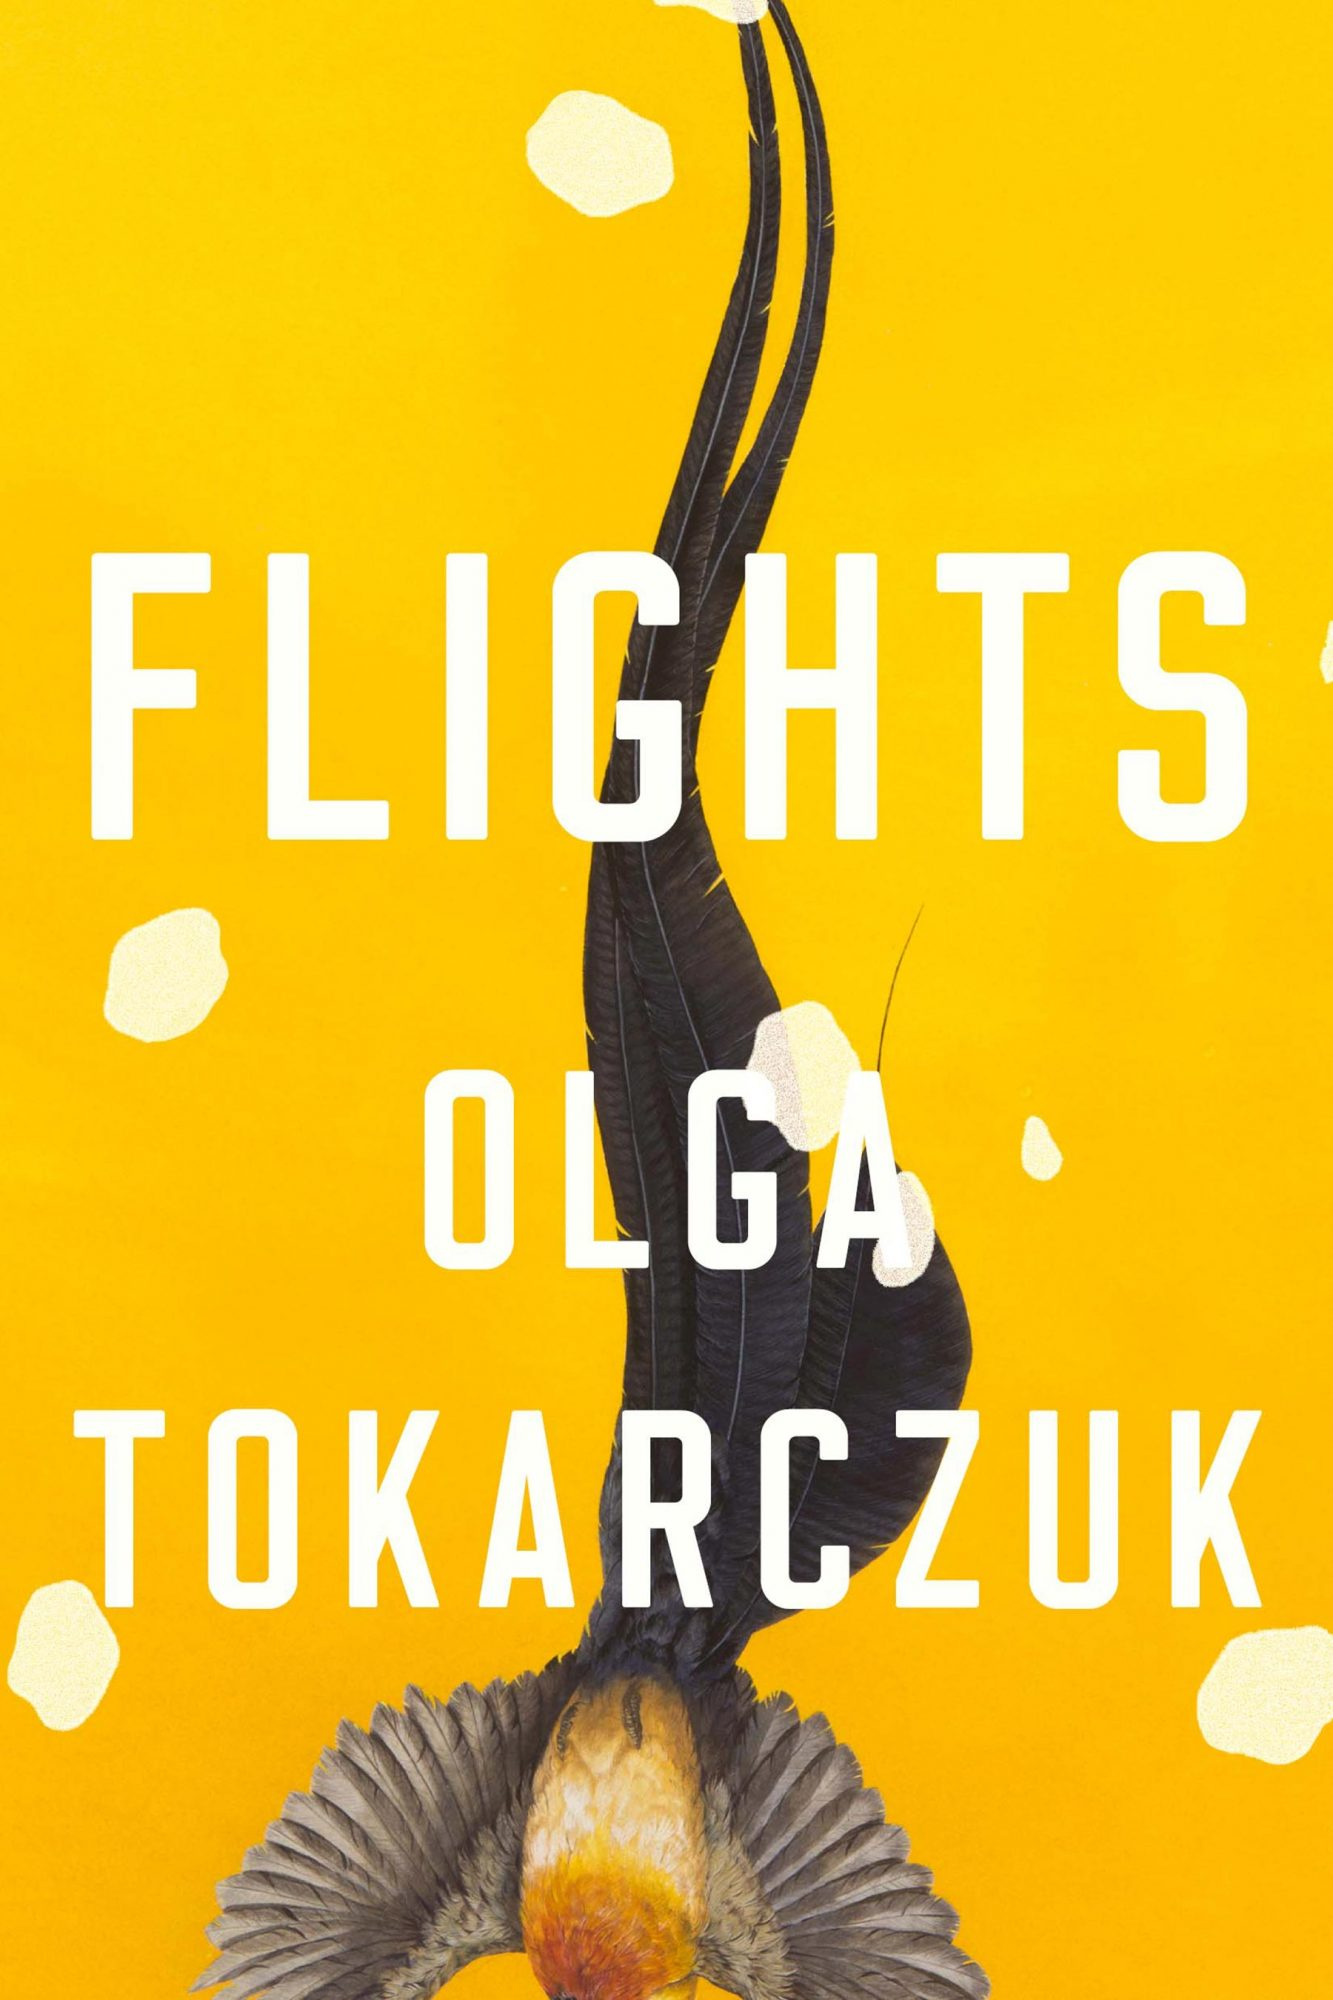 Flights by Olga Tokarczuk CR: Penguin